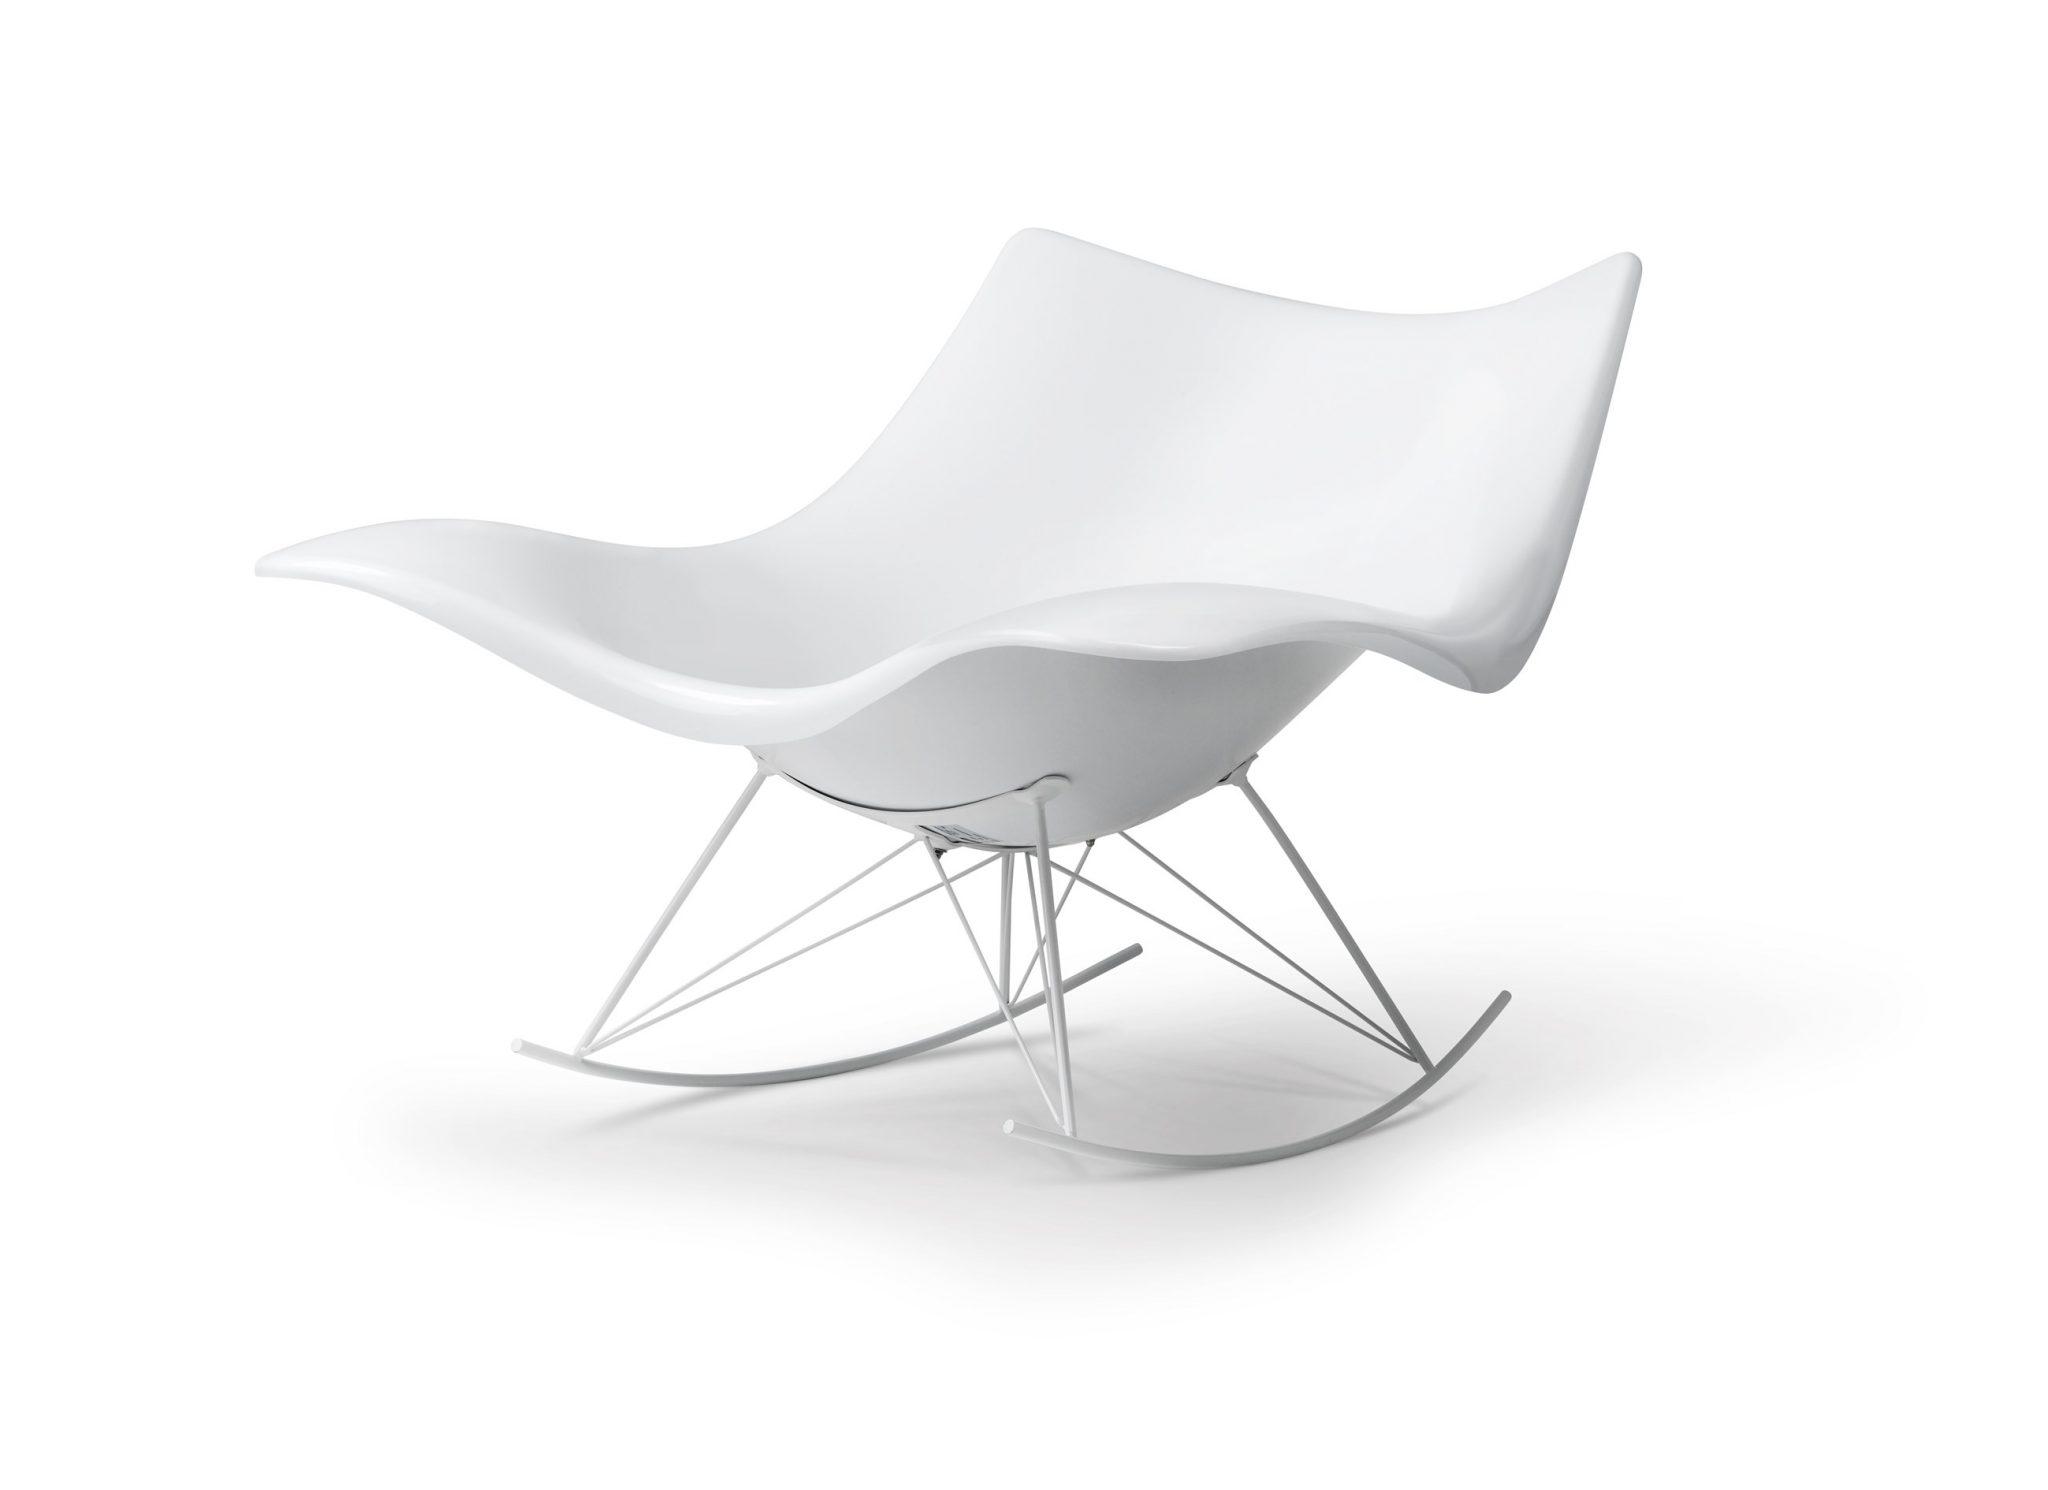 Pleasant Stingray Rocking Chair Design Thomas Pedersen Fredericia Pdpeps Interior Chair Design Pdpepsorg